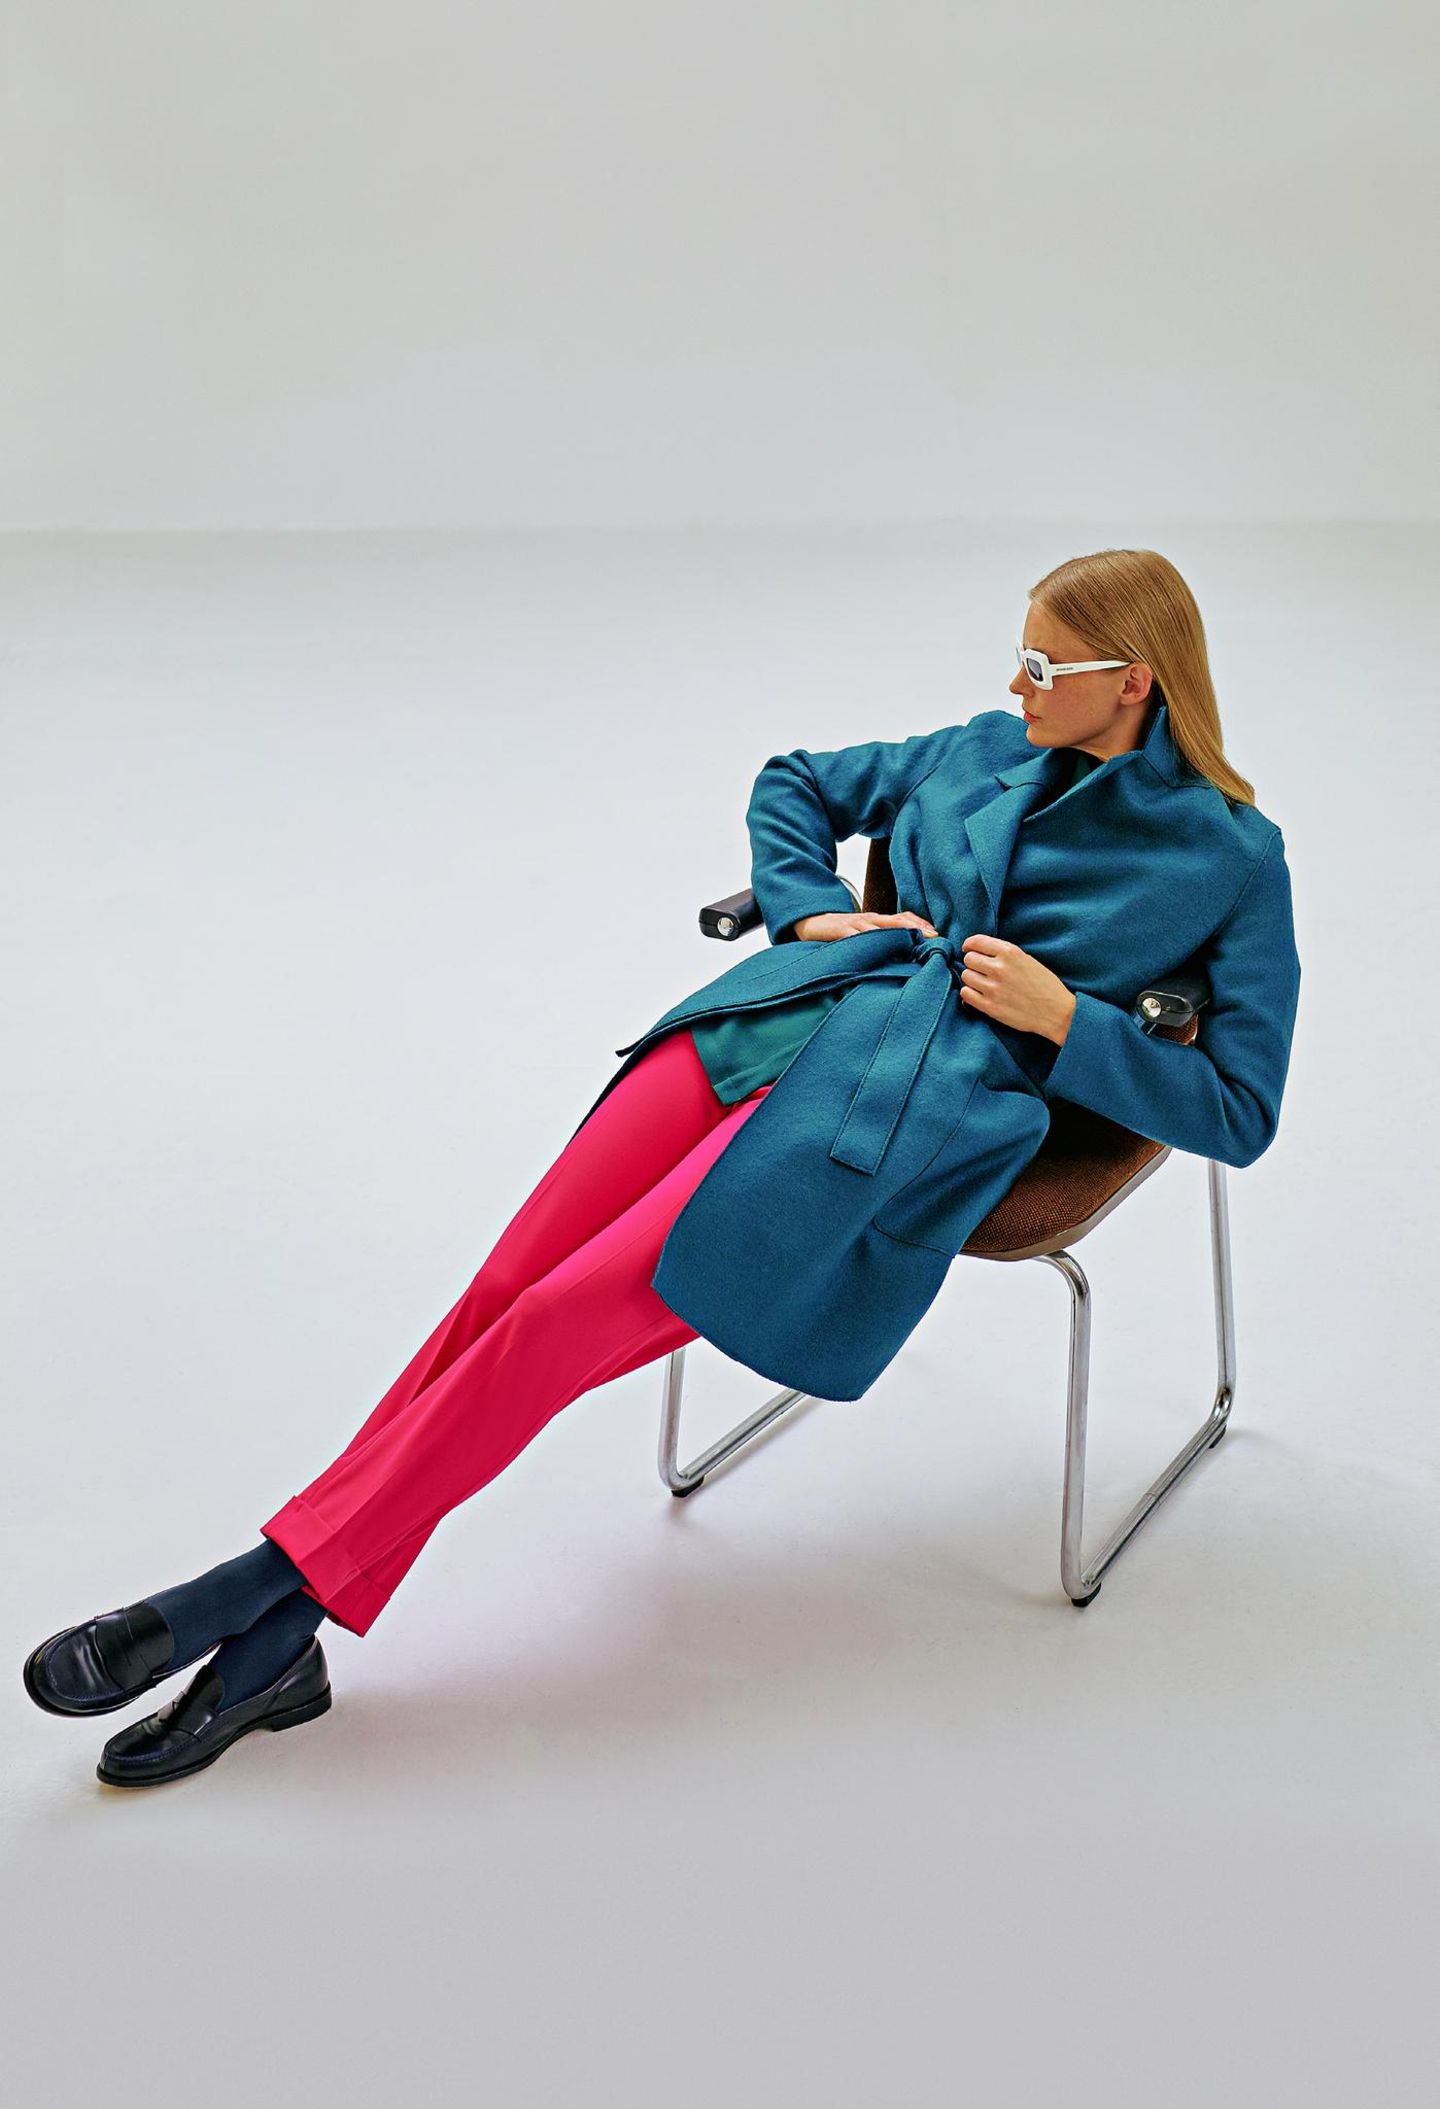 Business-Outfits 2020: Jobmode im Retro-Chic: Wollmantel zu Zigarettenhose